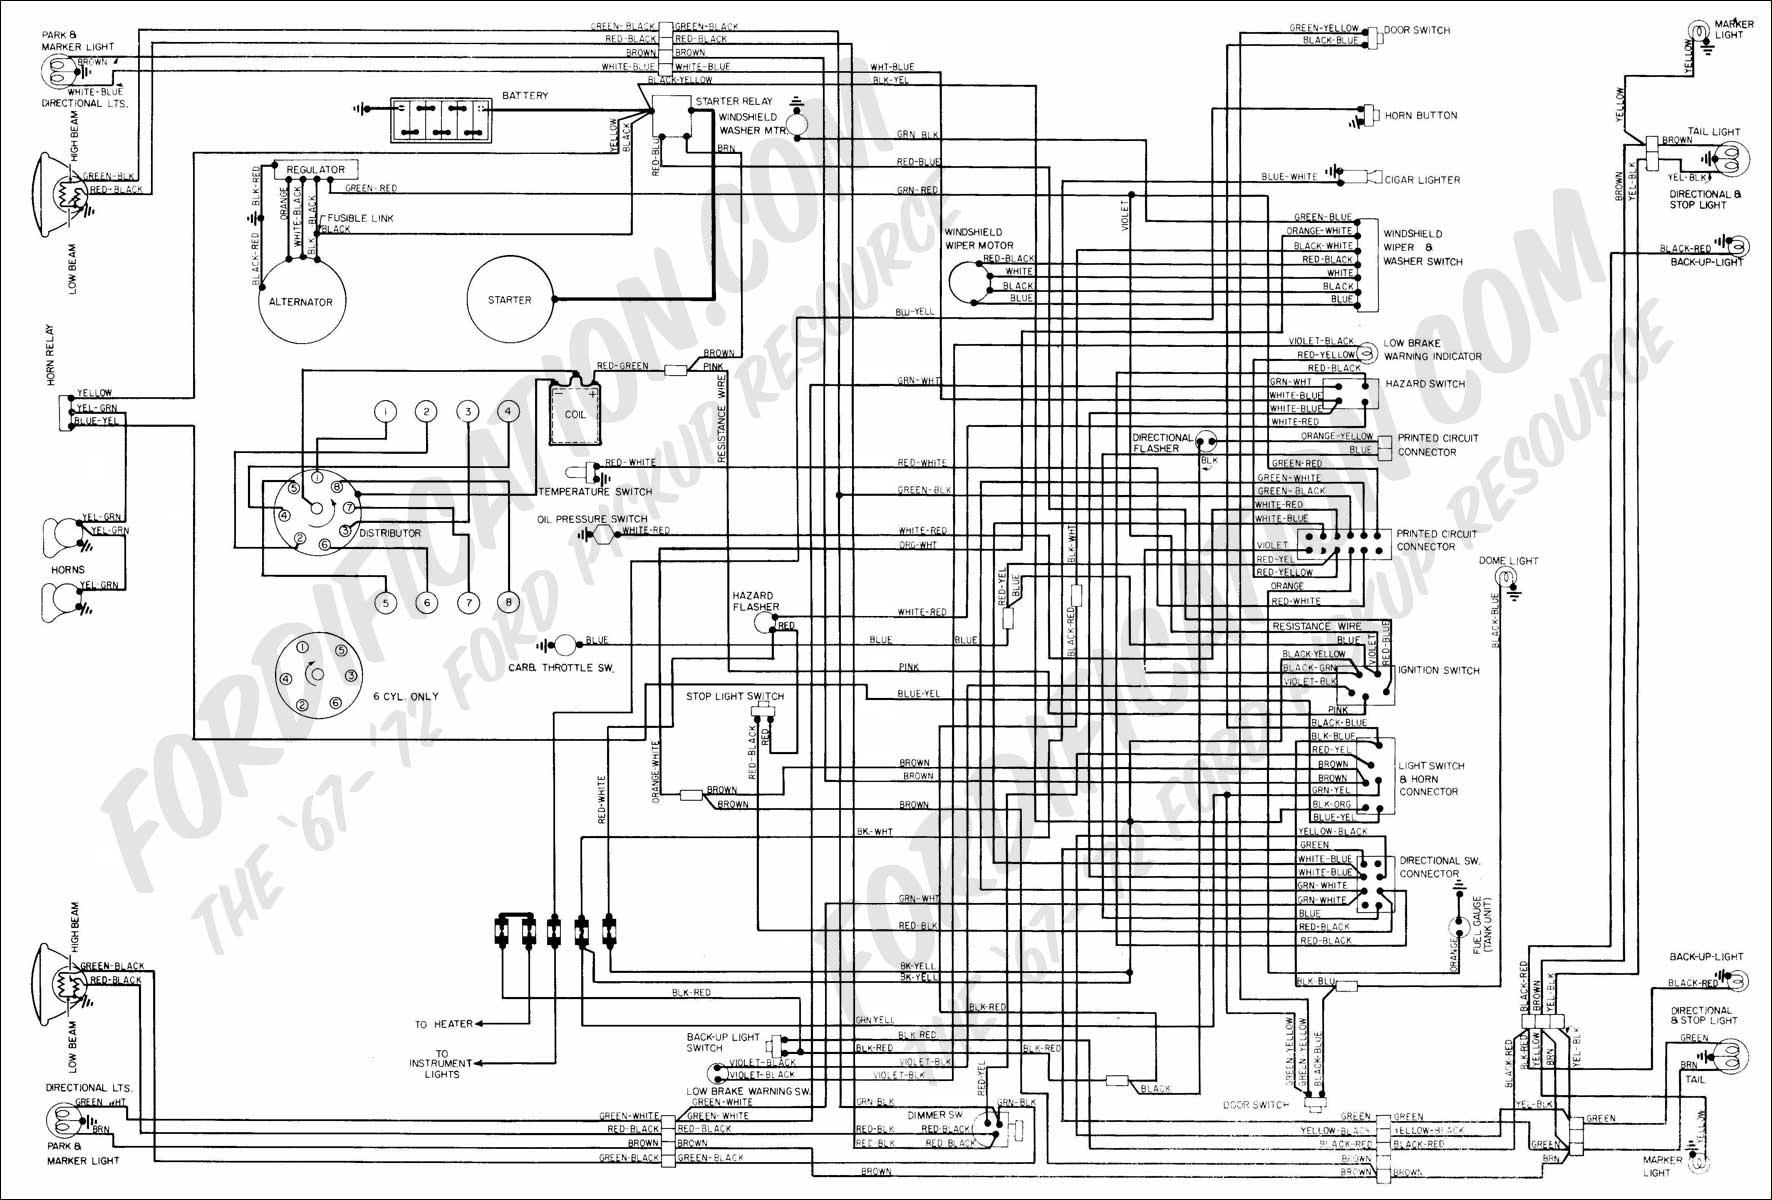 Brilliant F150 Wiring Schematic Basic Electronics Wiring Diagram Wiring Cloud Filiciilluminateatxorg